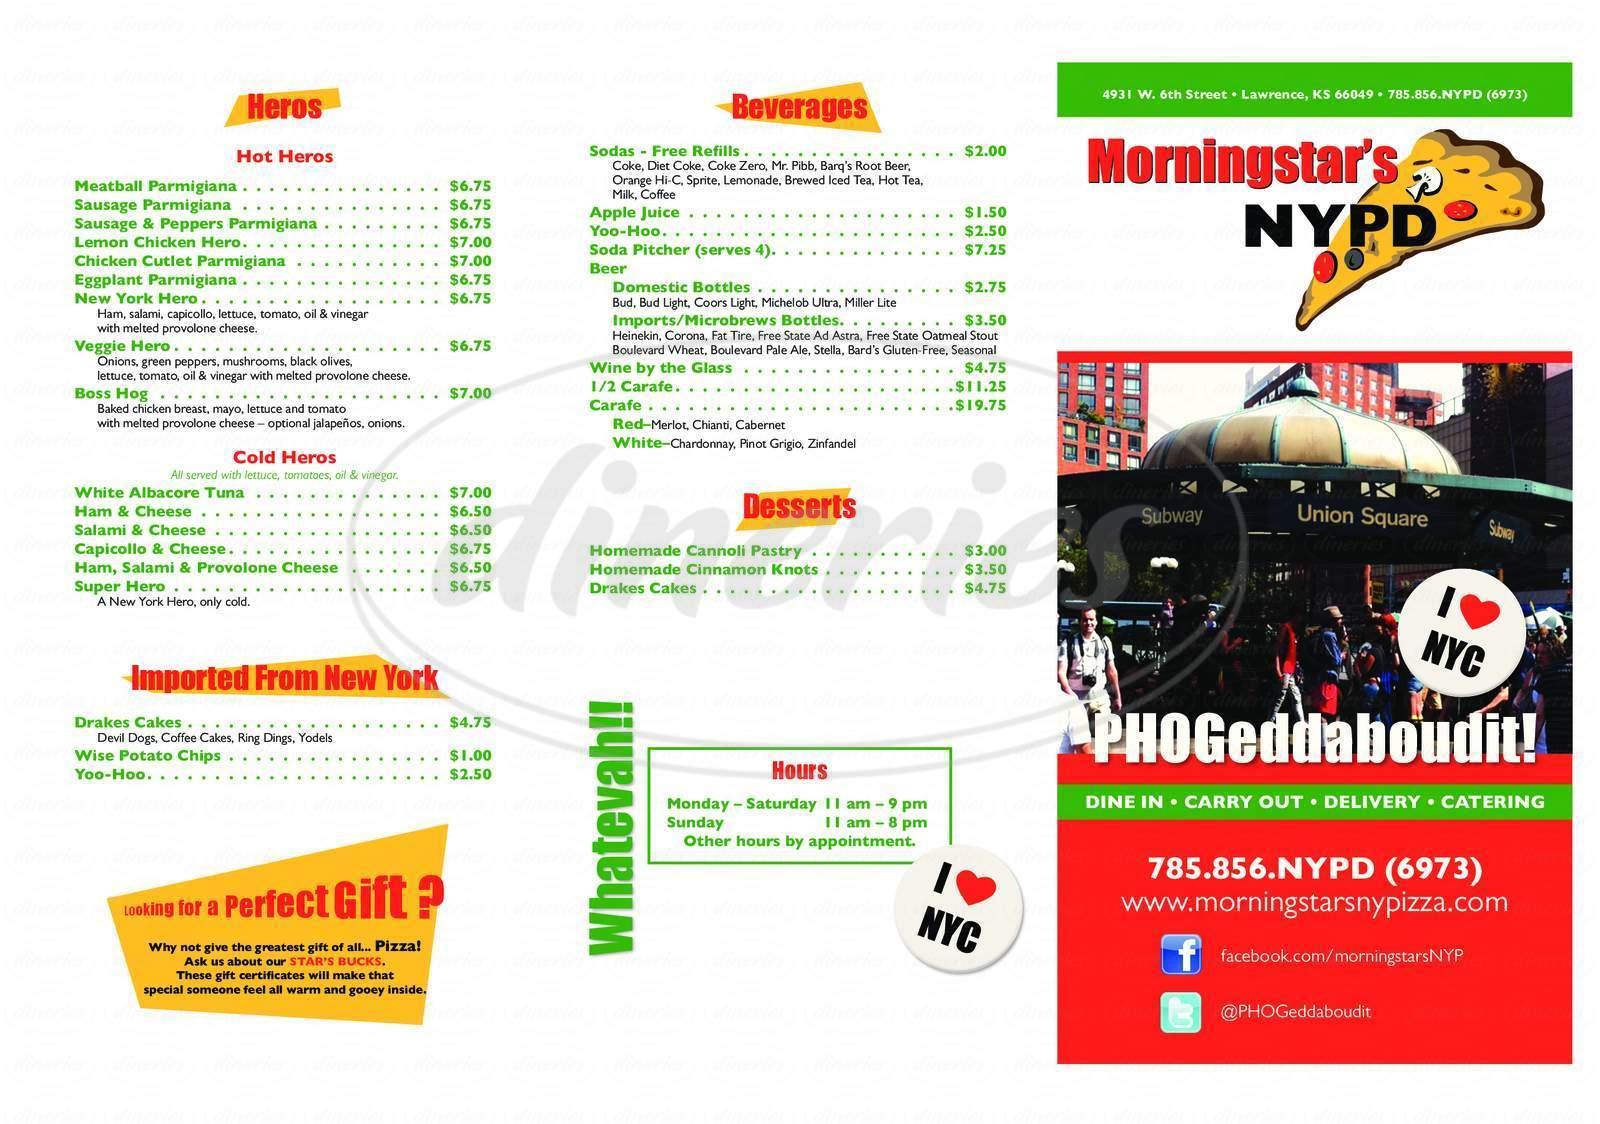 menu for Morningstar's NYPD